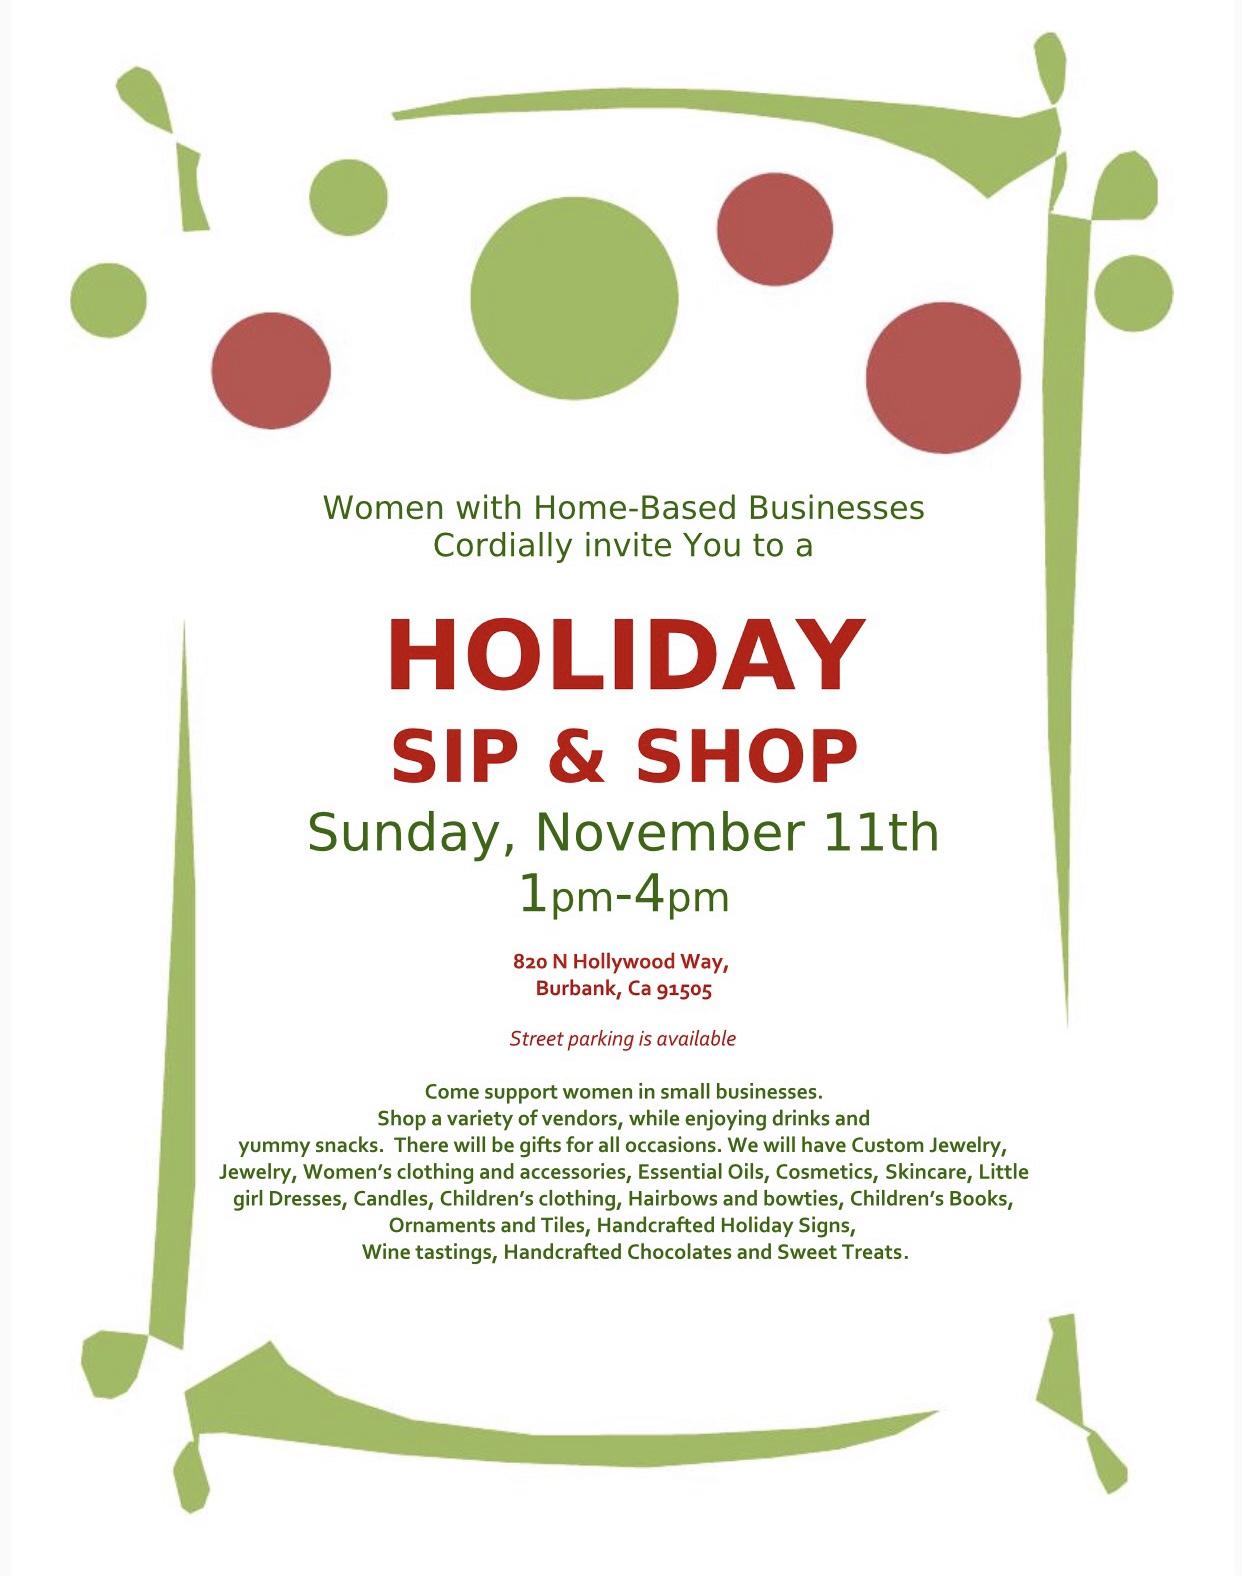 Holiday Sip 'N Shop